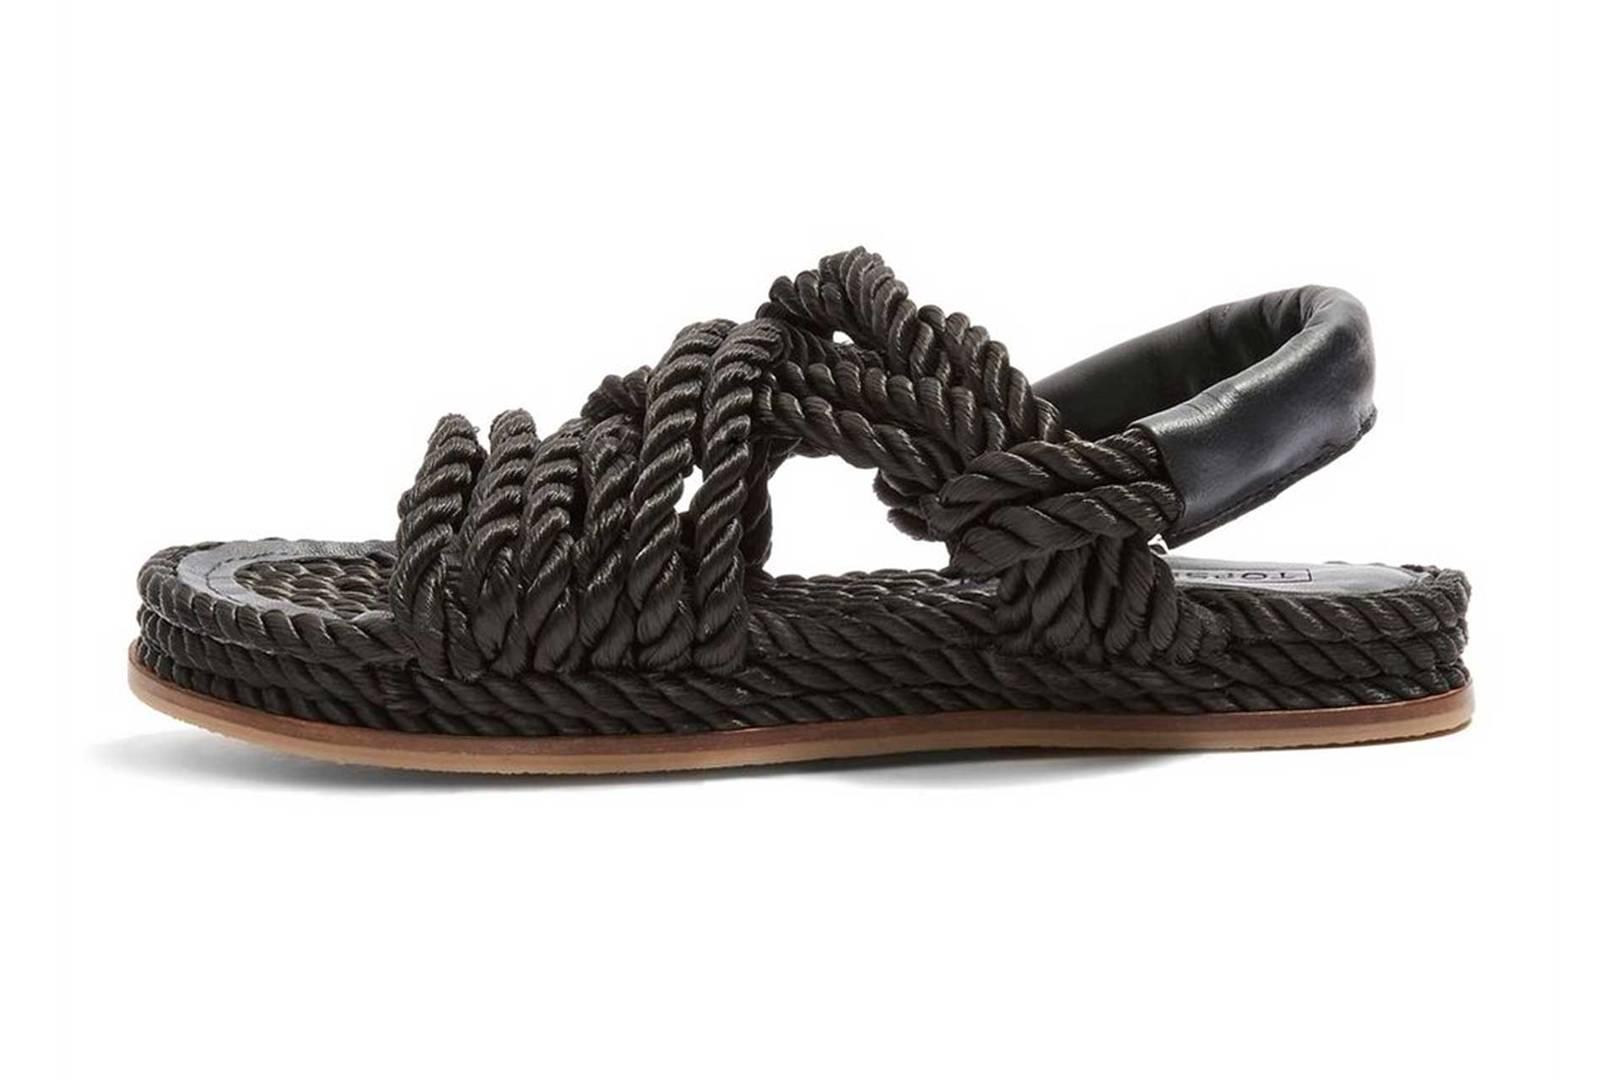 09eb15cb58e0 Best Summer Sandals 2018  The Vogue Edit